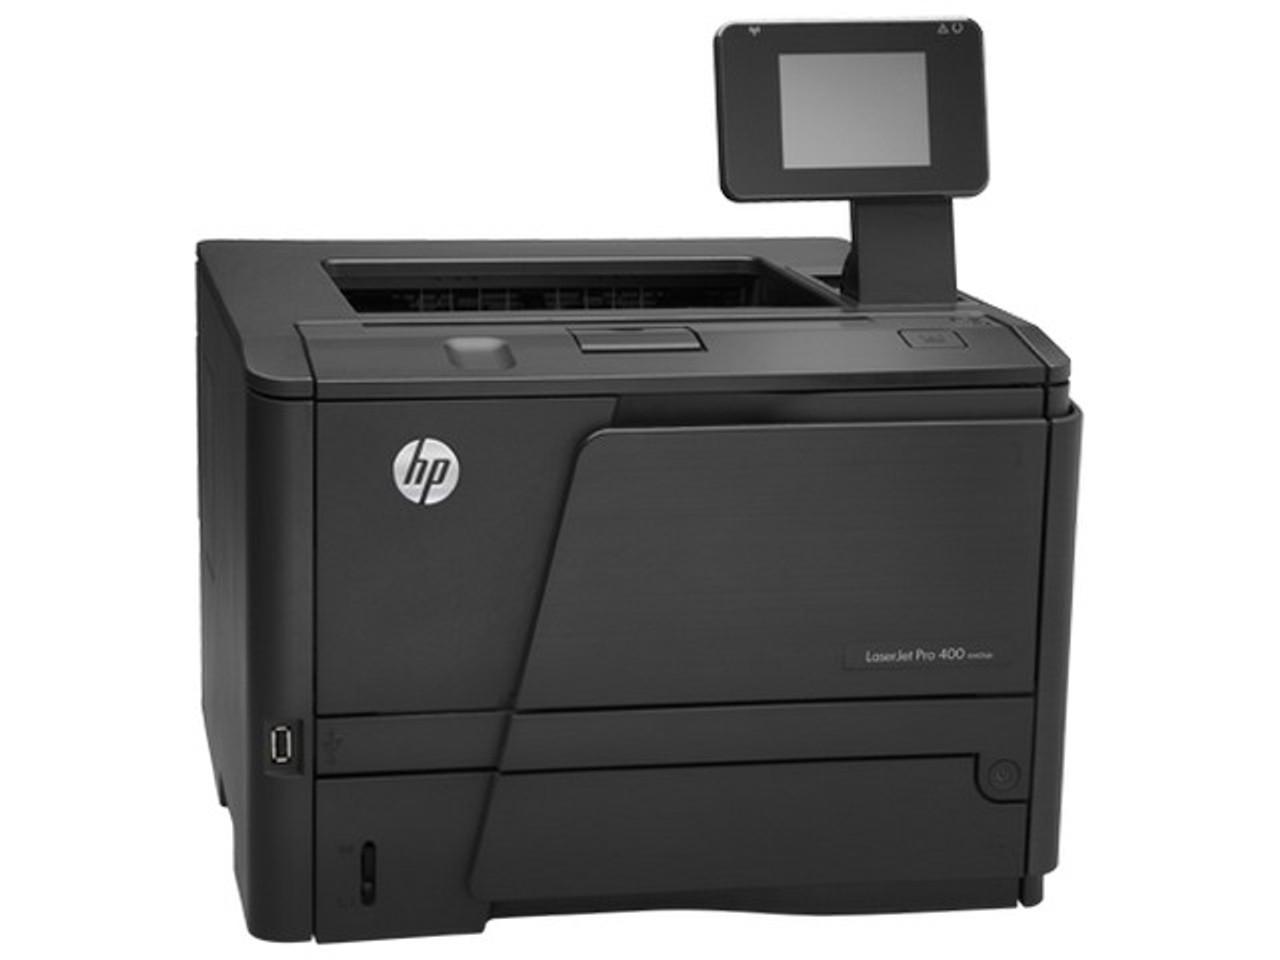 HP LaserJet 400 M401dn - CF278A - HP Laser Printer for sale